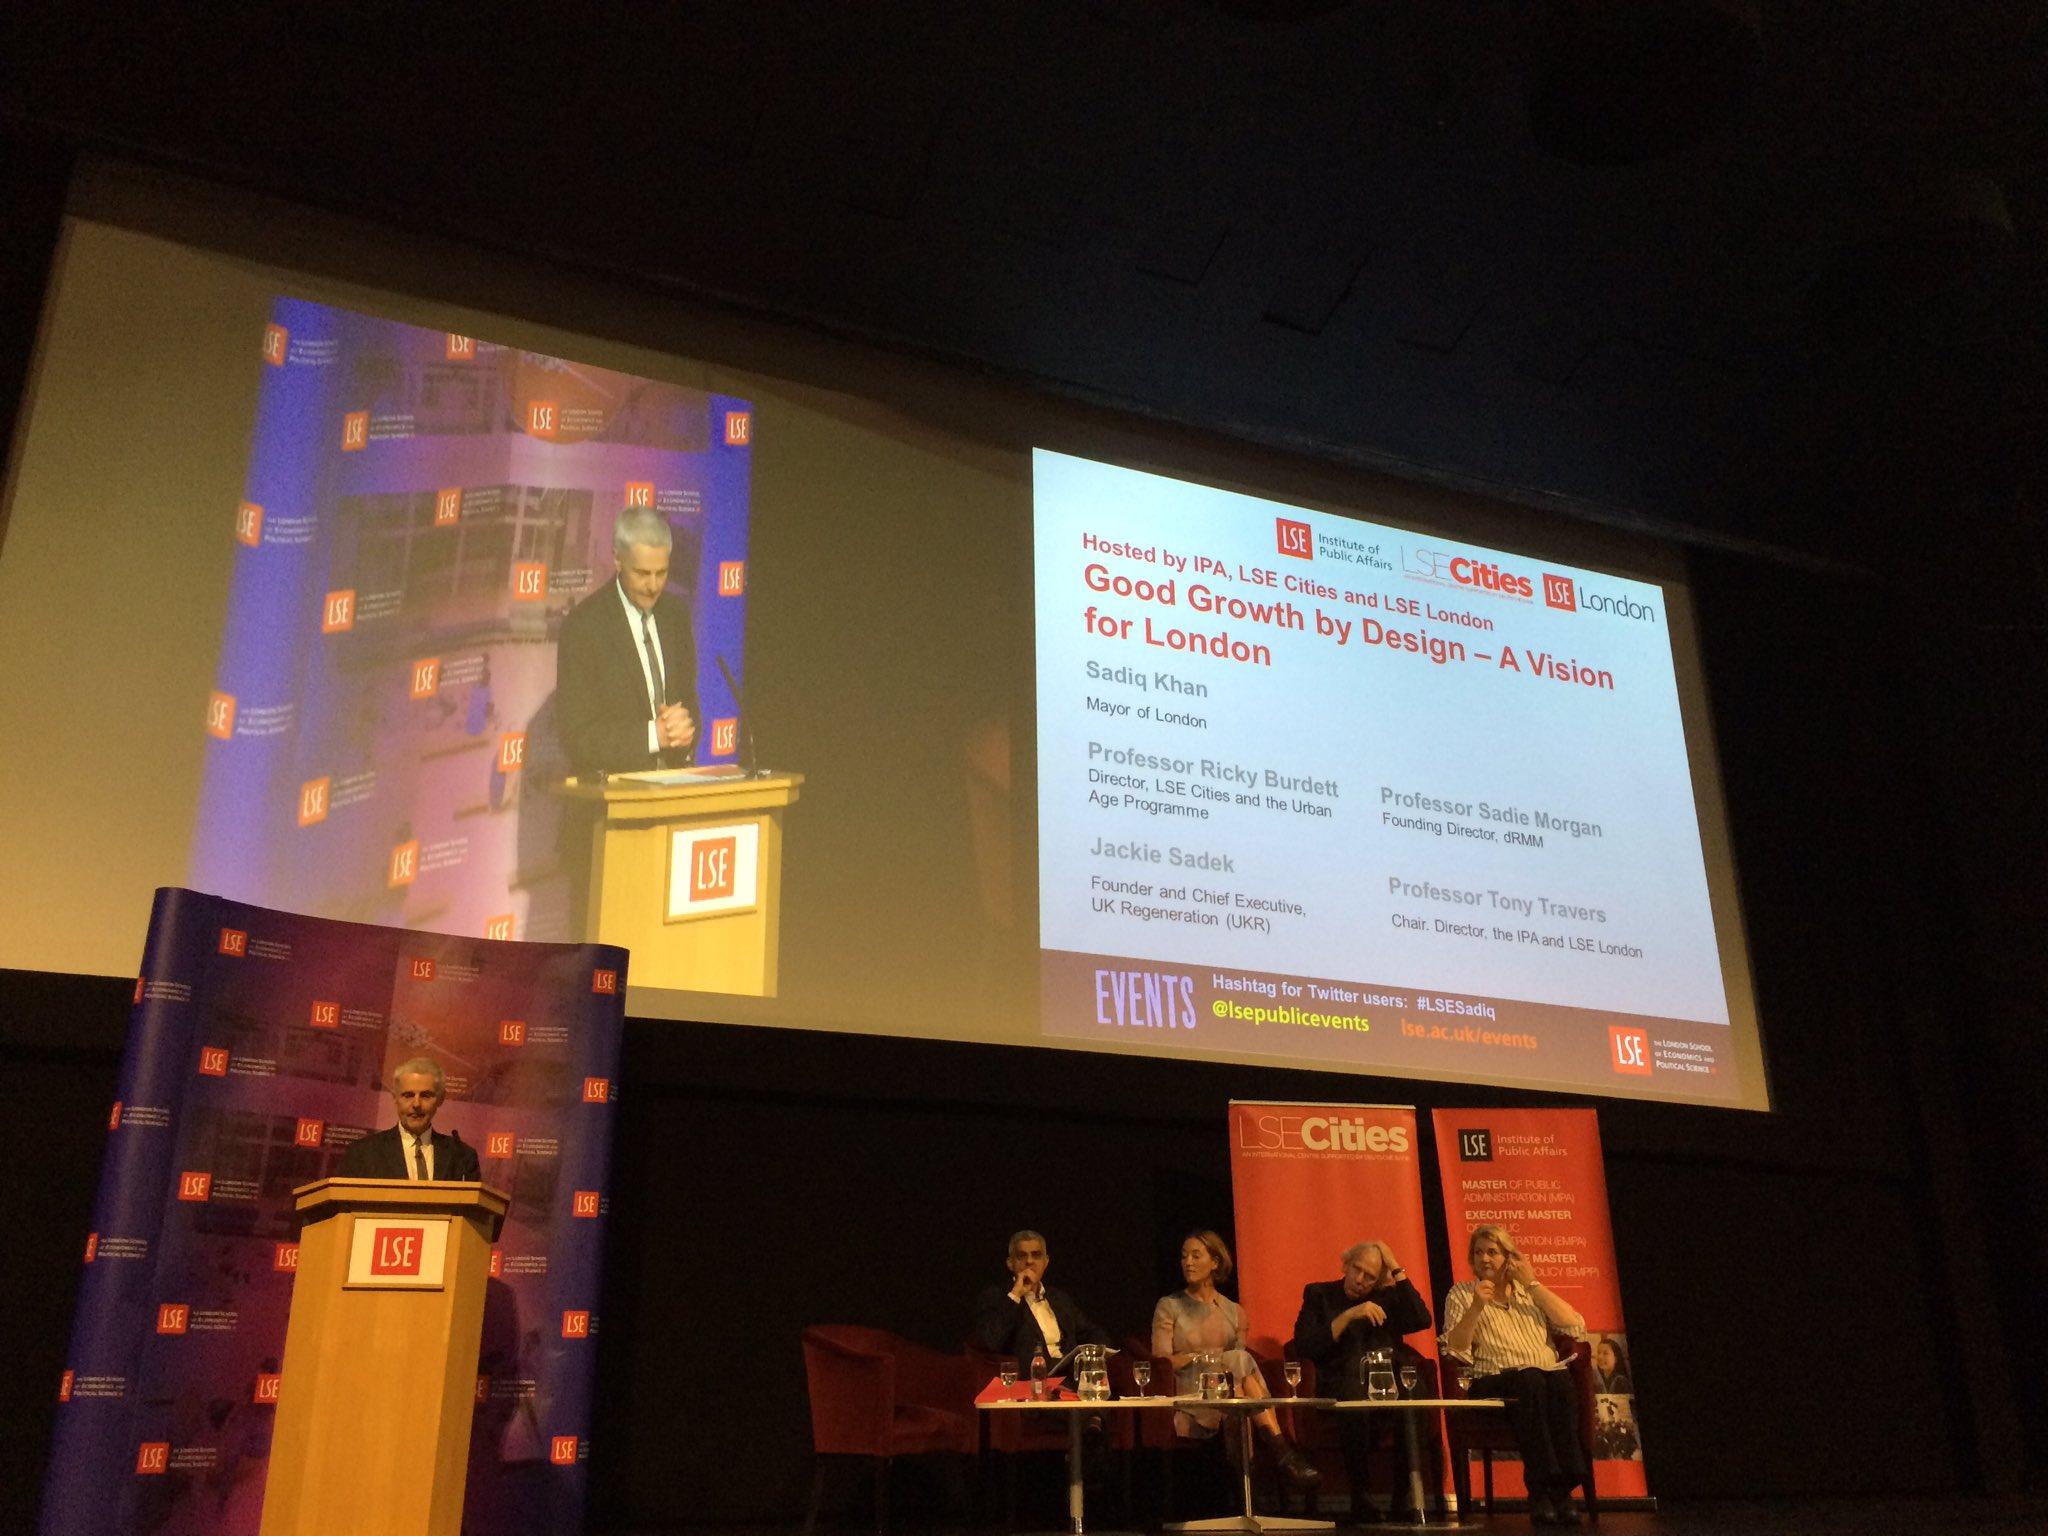 Professor Tony Travers opening the #LSESadiq event tonight #London @LSEPubAffairs @LSE_MPA https://t.co/ksHWs5eUza